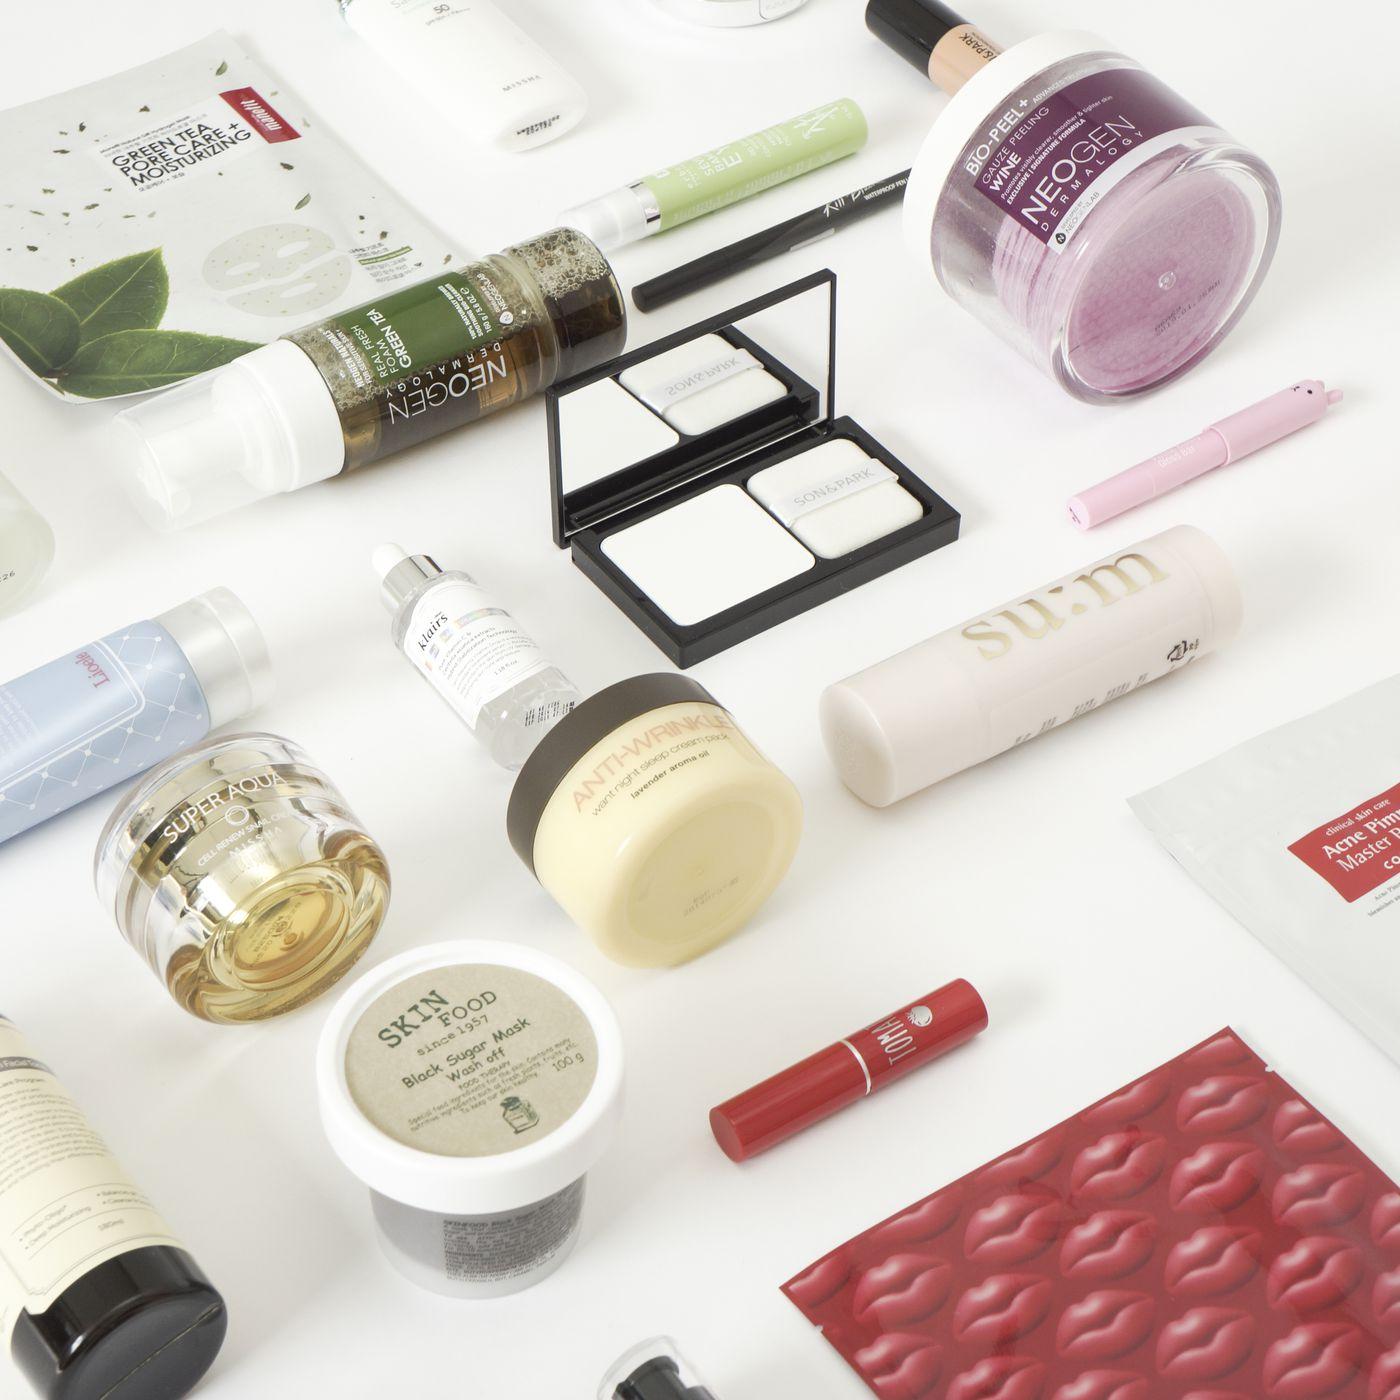 Why No One Single Brand Is Winning K-Beauty - Racked